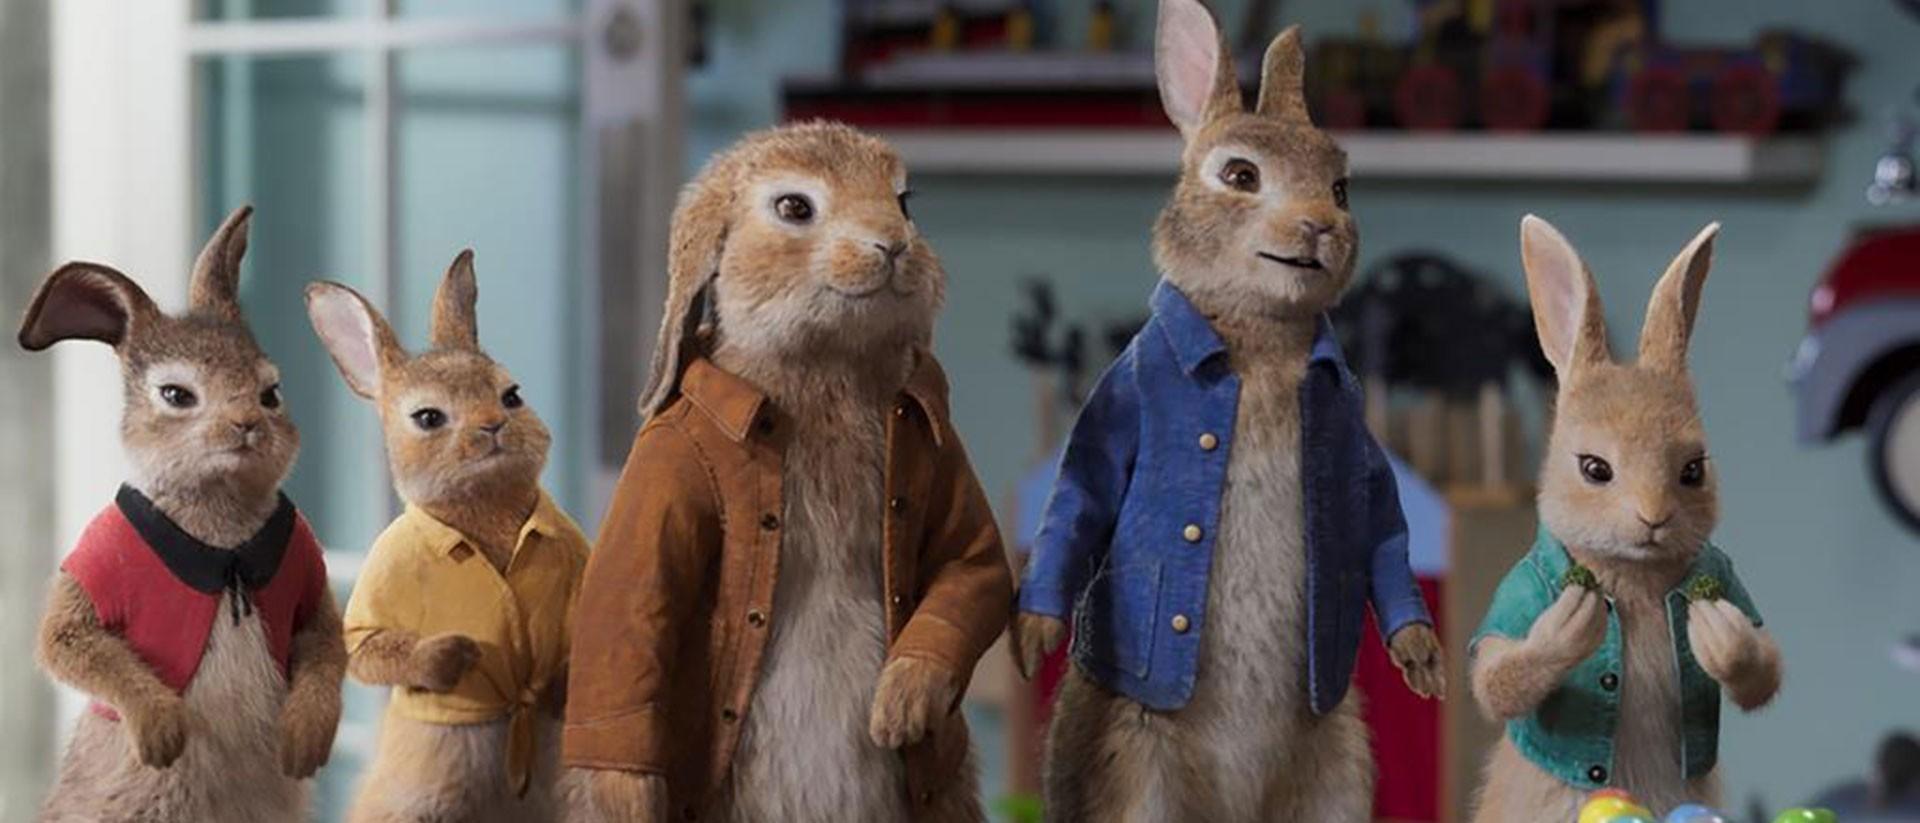 Peter Rabbit 2:The Runaway